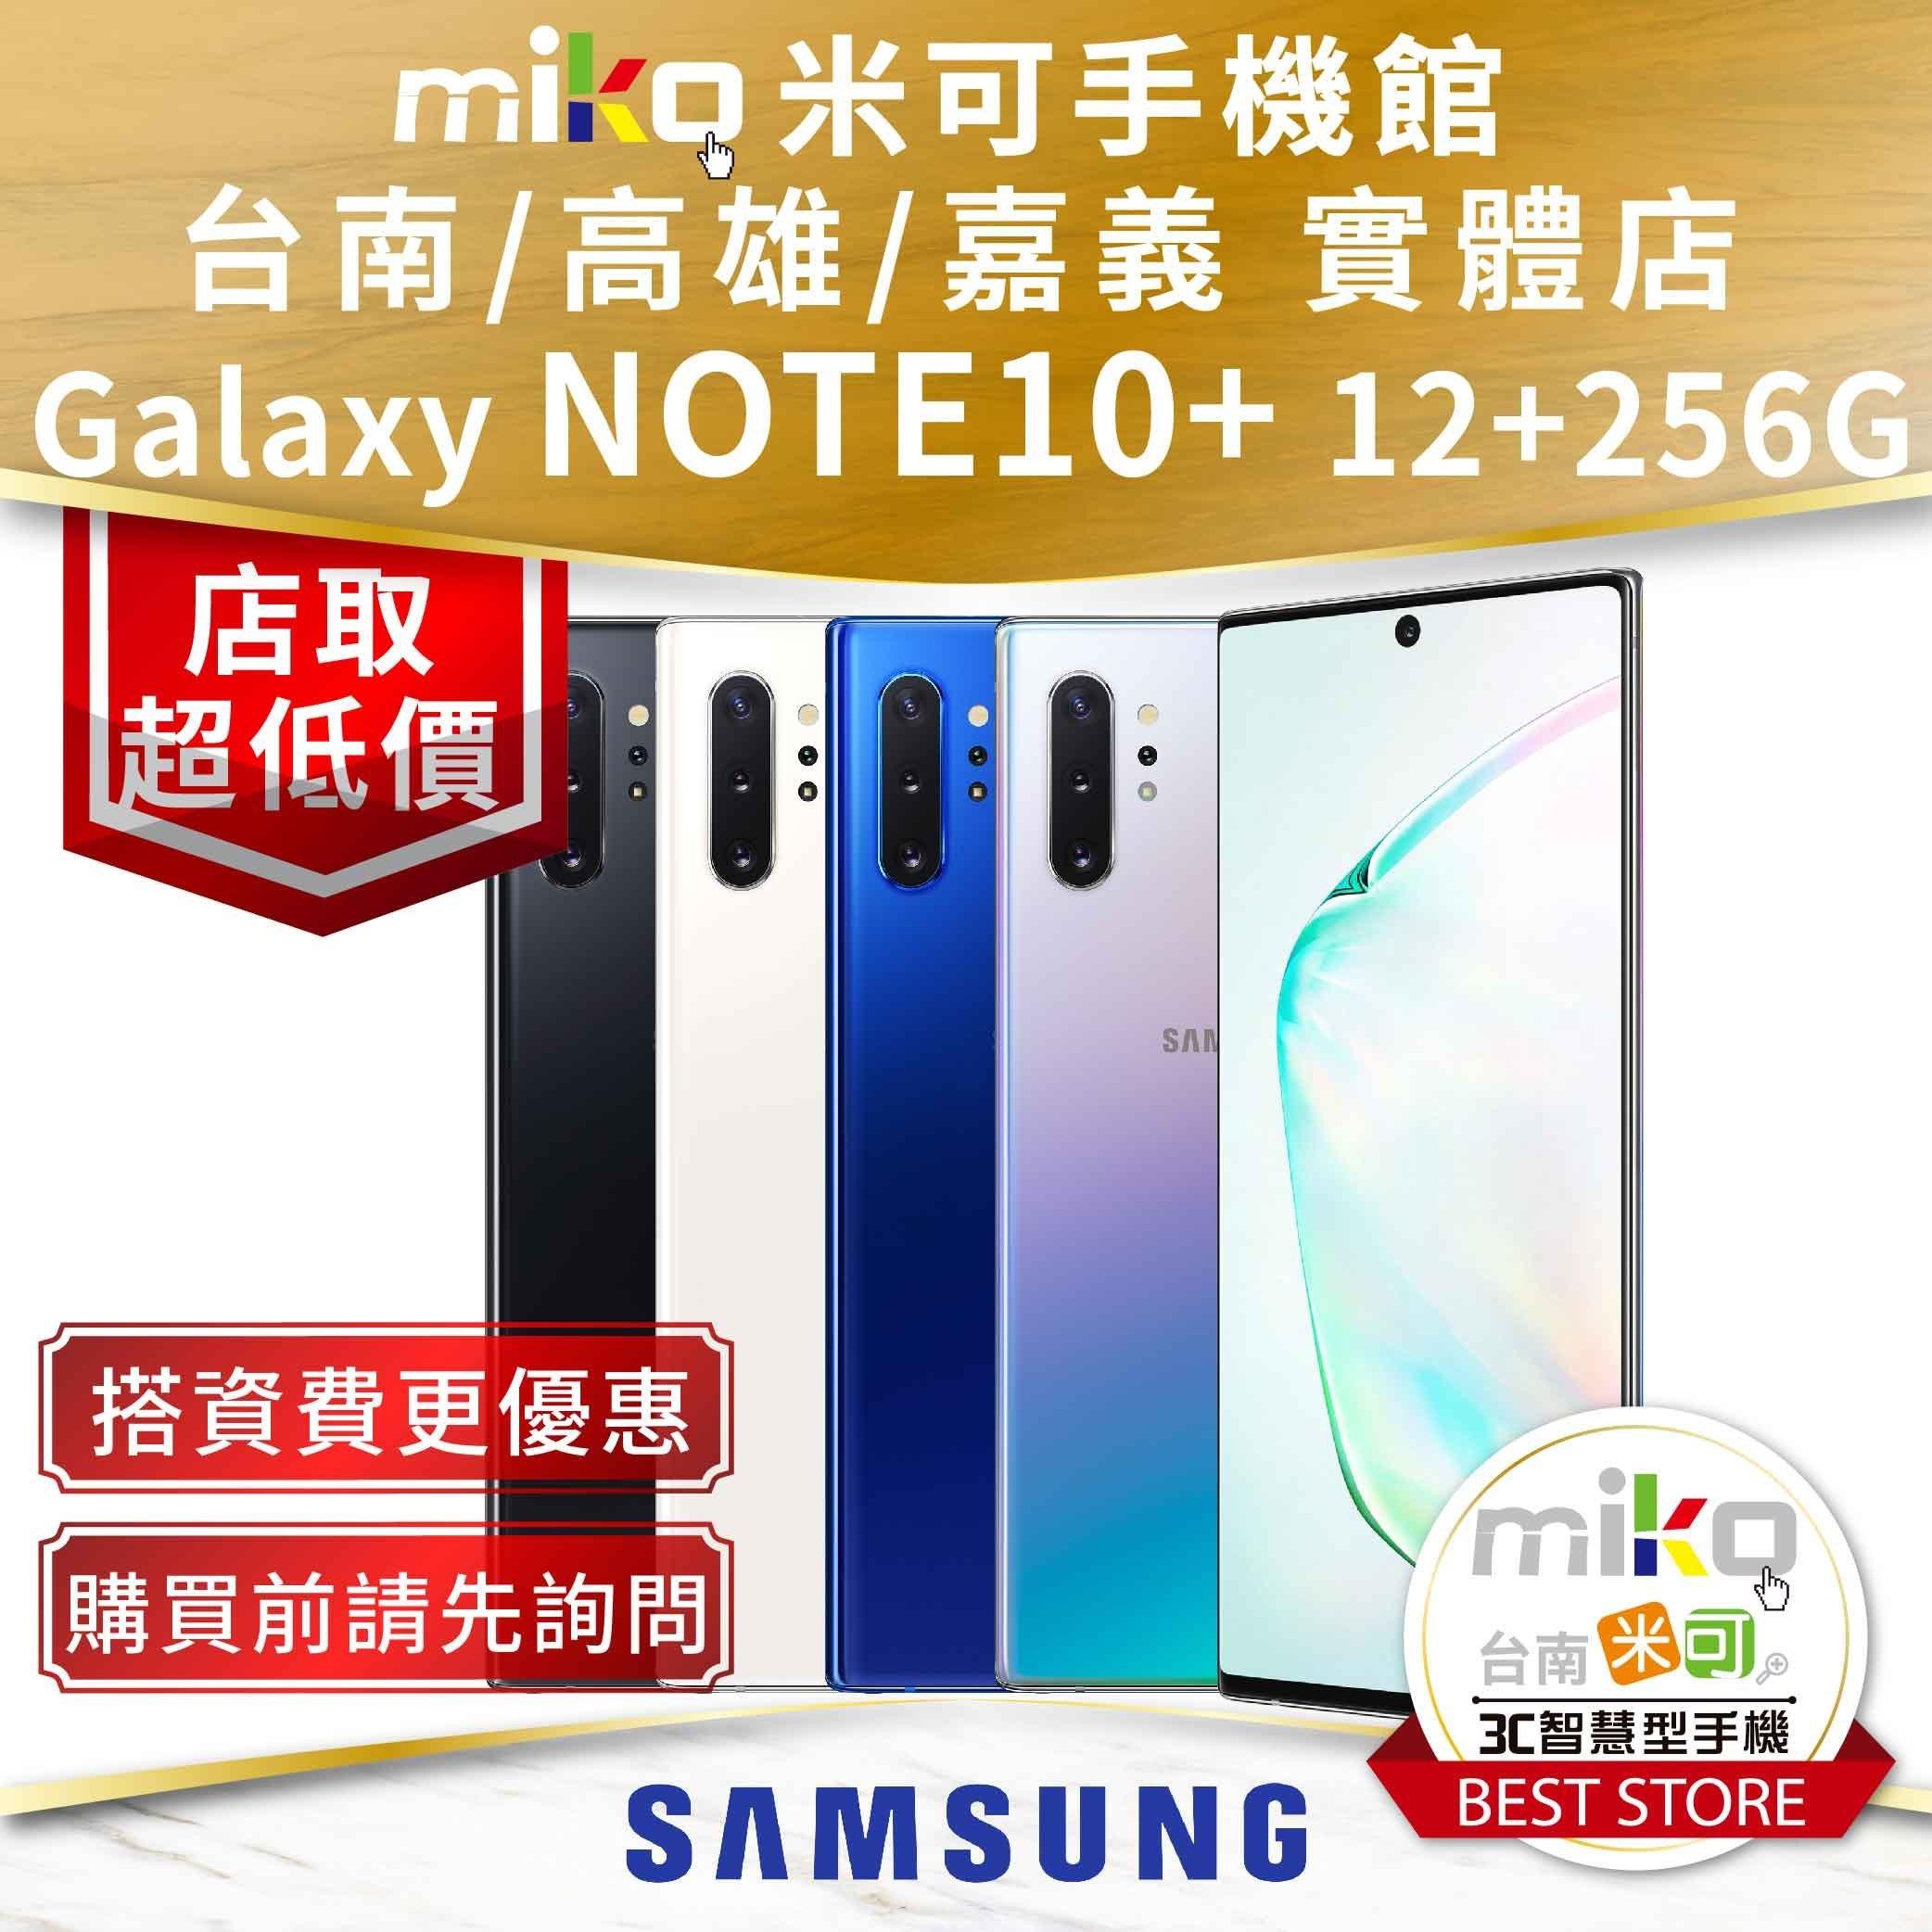 SAMSUNG Galaxy Note10+ 12G/256G 銀空機$24990【台南高雄嘉義MIKO米可手機館】